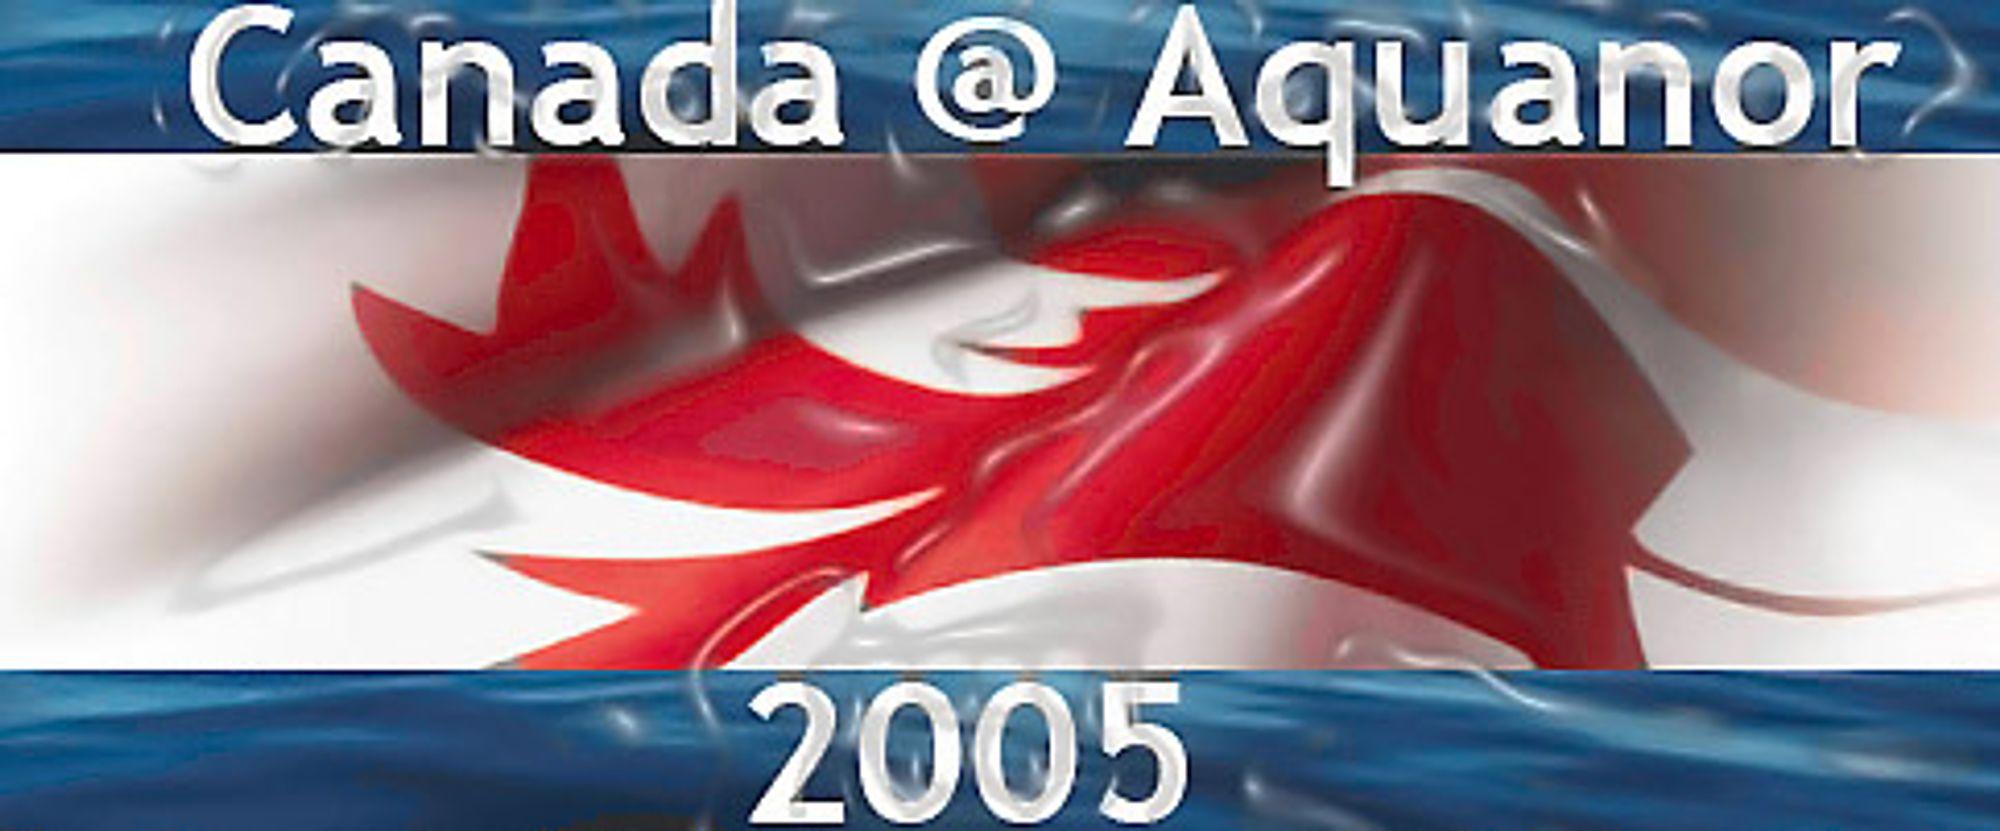 Canada har liaget sin egen logo for kjempesatsingen på Aquanor.